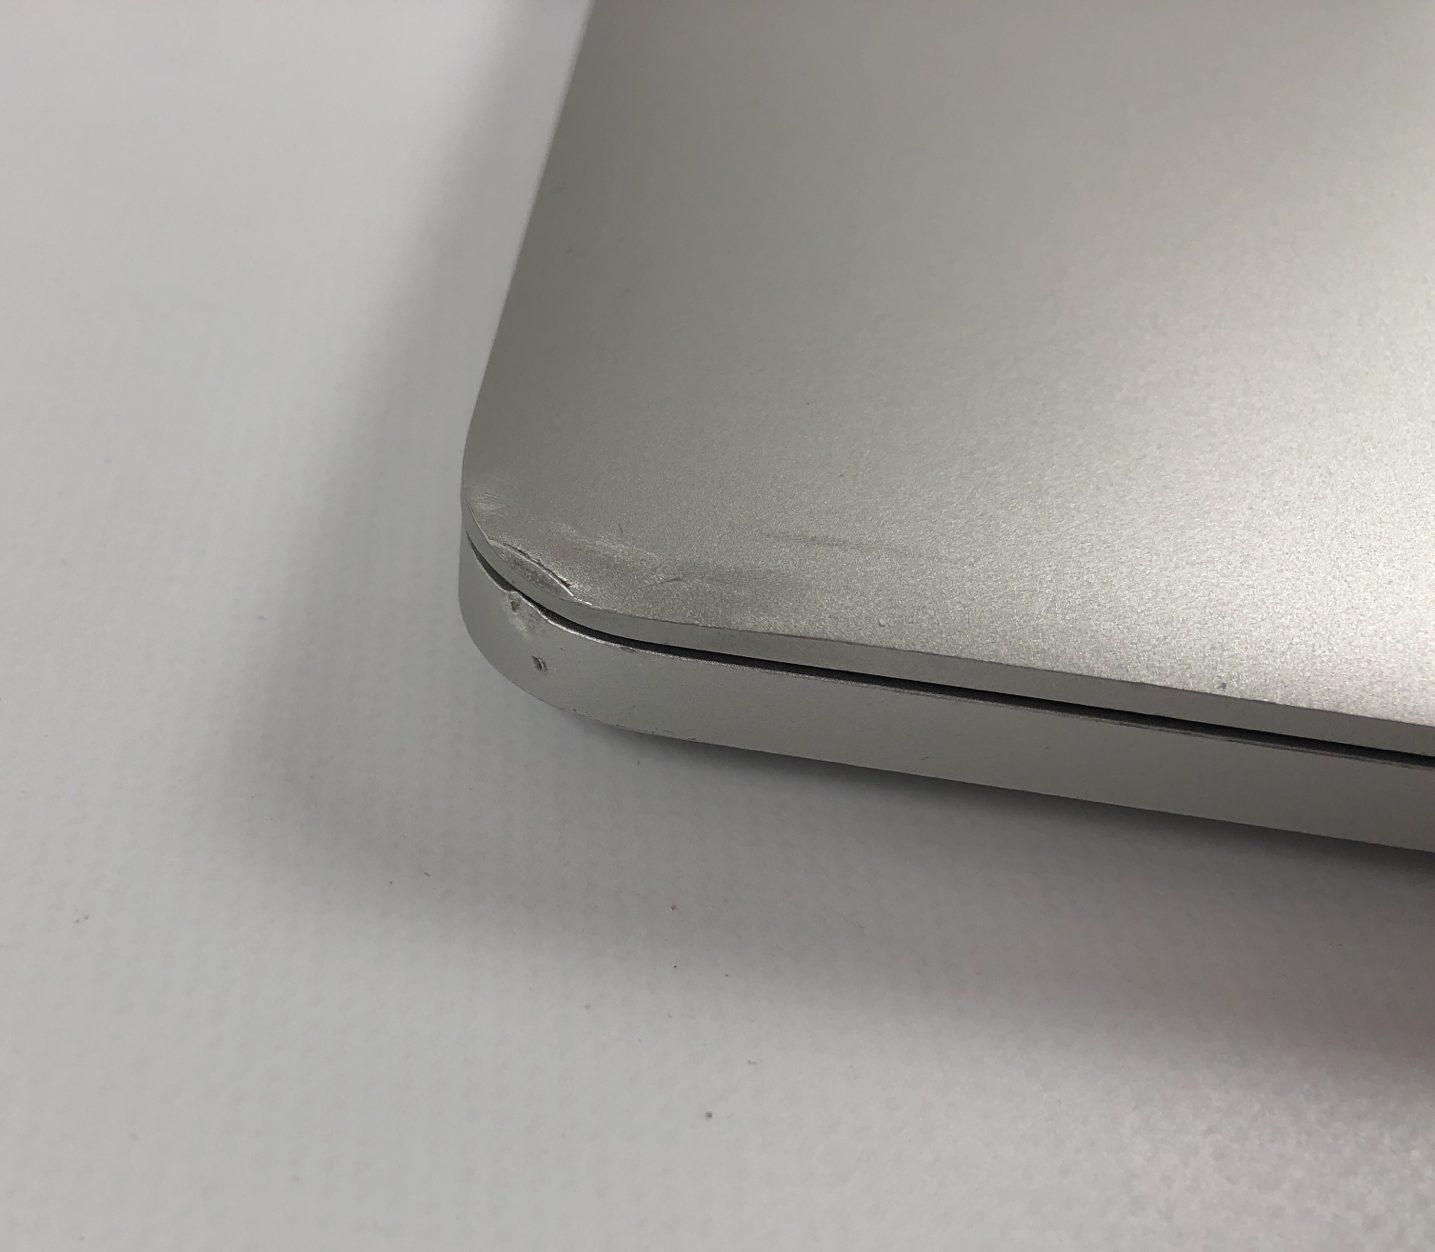 "MacBook Pro Retina 13"" Early 2015 (Intel Core i5 2.7 GHz 8 GB RAM 256 GB SSD), Intel Core i5 2.7 GHz, 8 GB RAM, 256 GB SSD, bild 3"